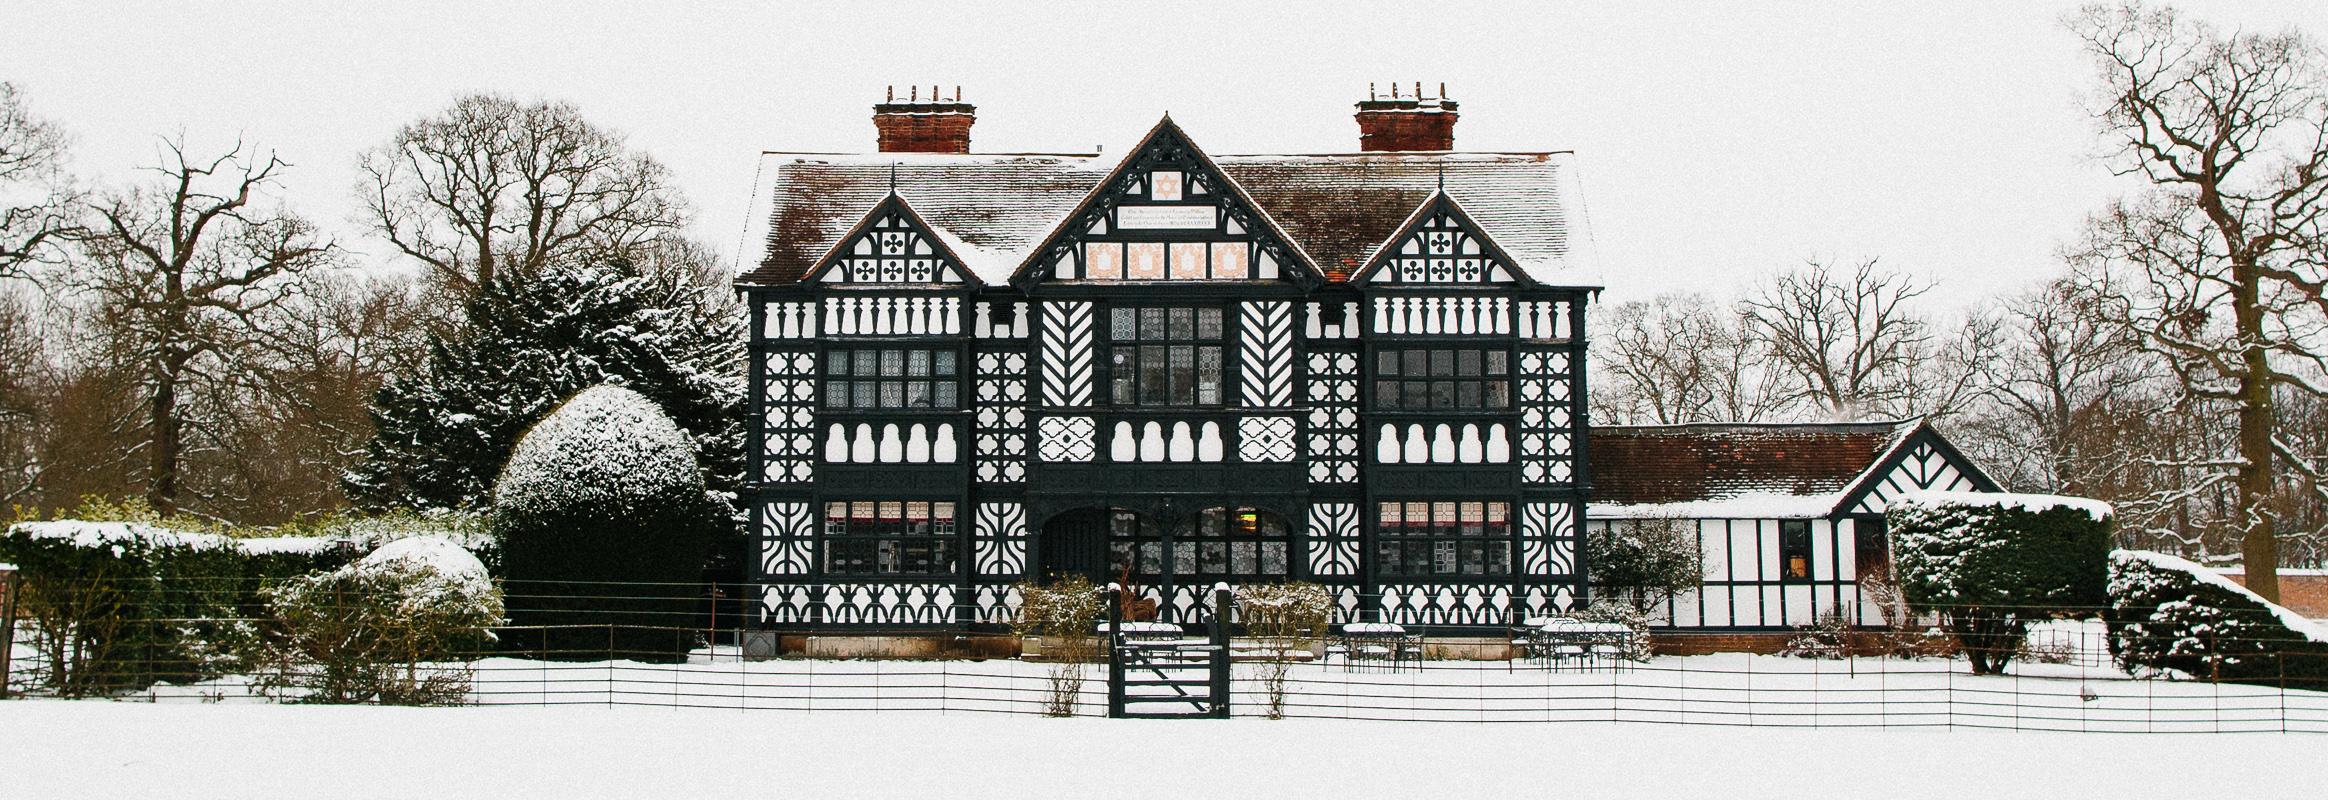 paris house snowy.jpg